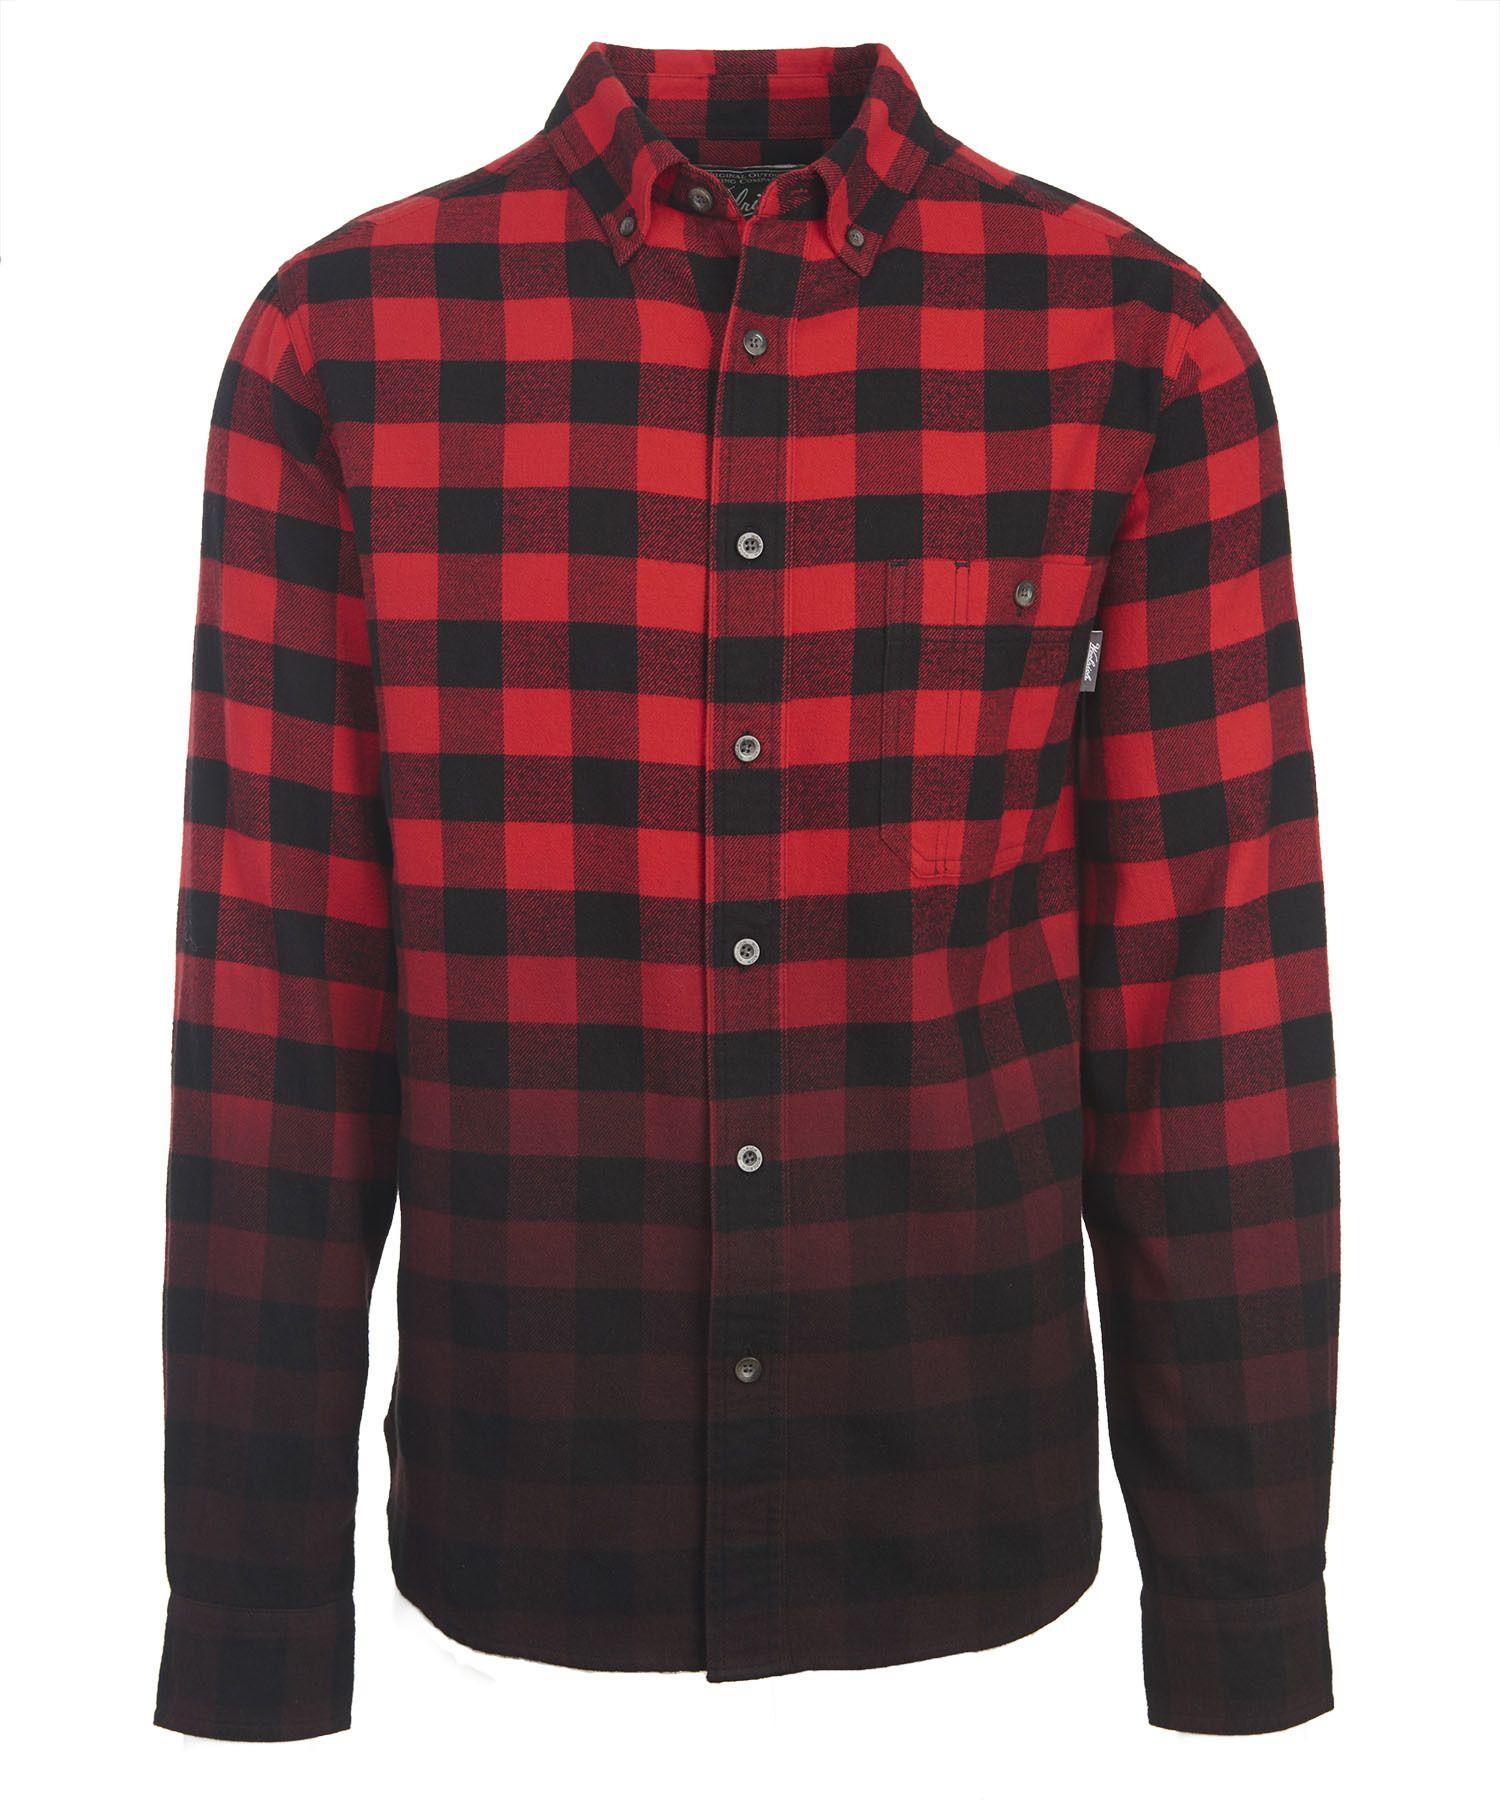 Men's Trout Run Dip Dye Flannel Shirt | Clothes | Pinterest | Dip ...